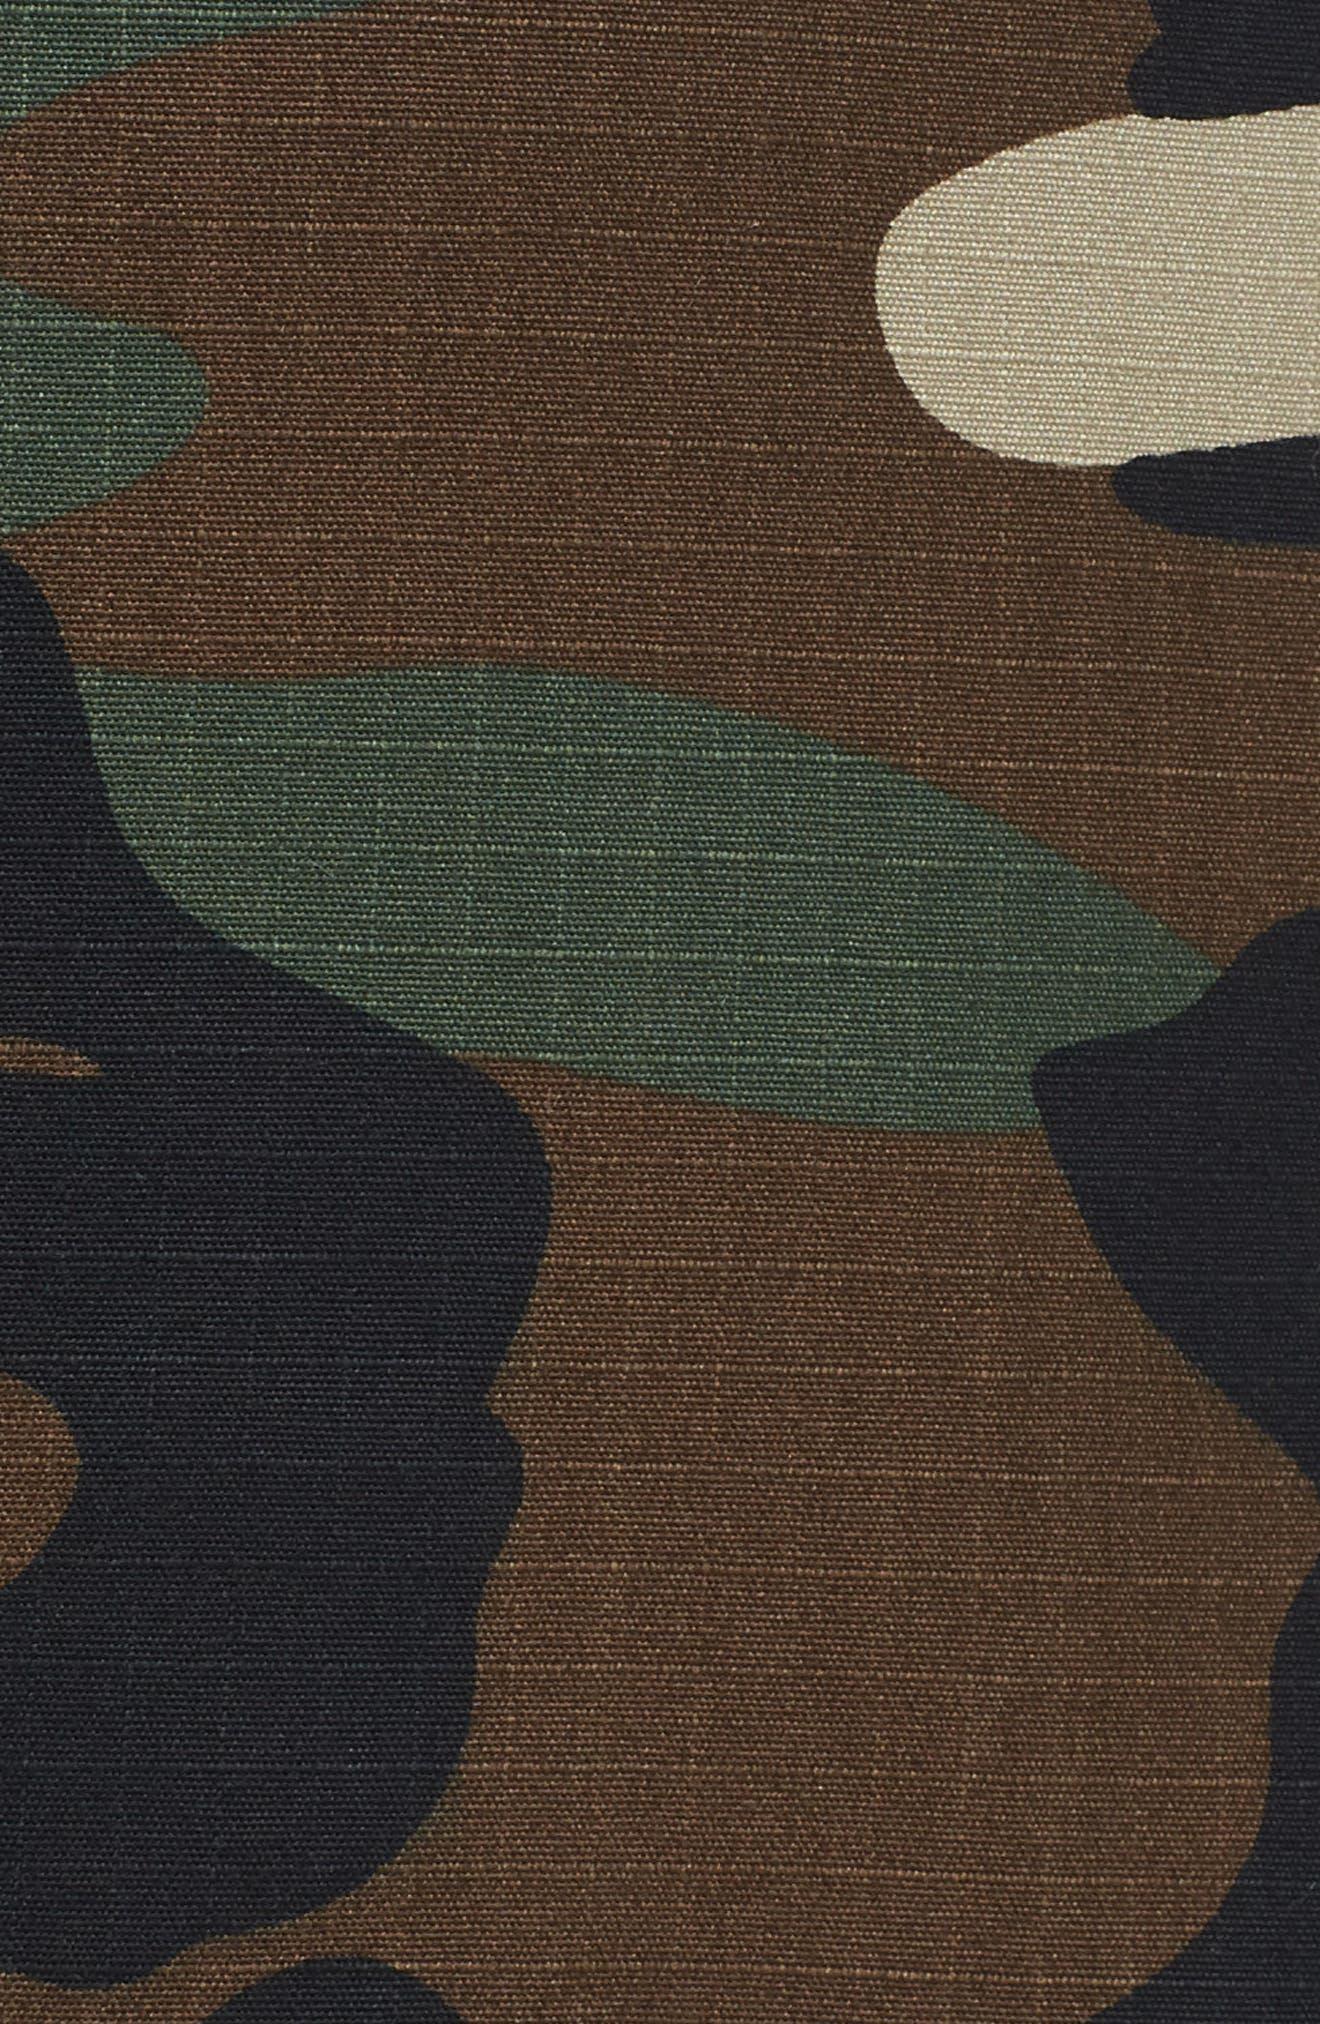 Recon Cargo Pants,                             Alternate thumbnail 5, color,                             Field Camo